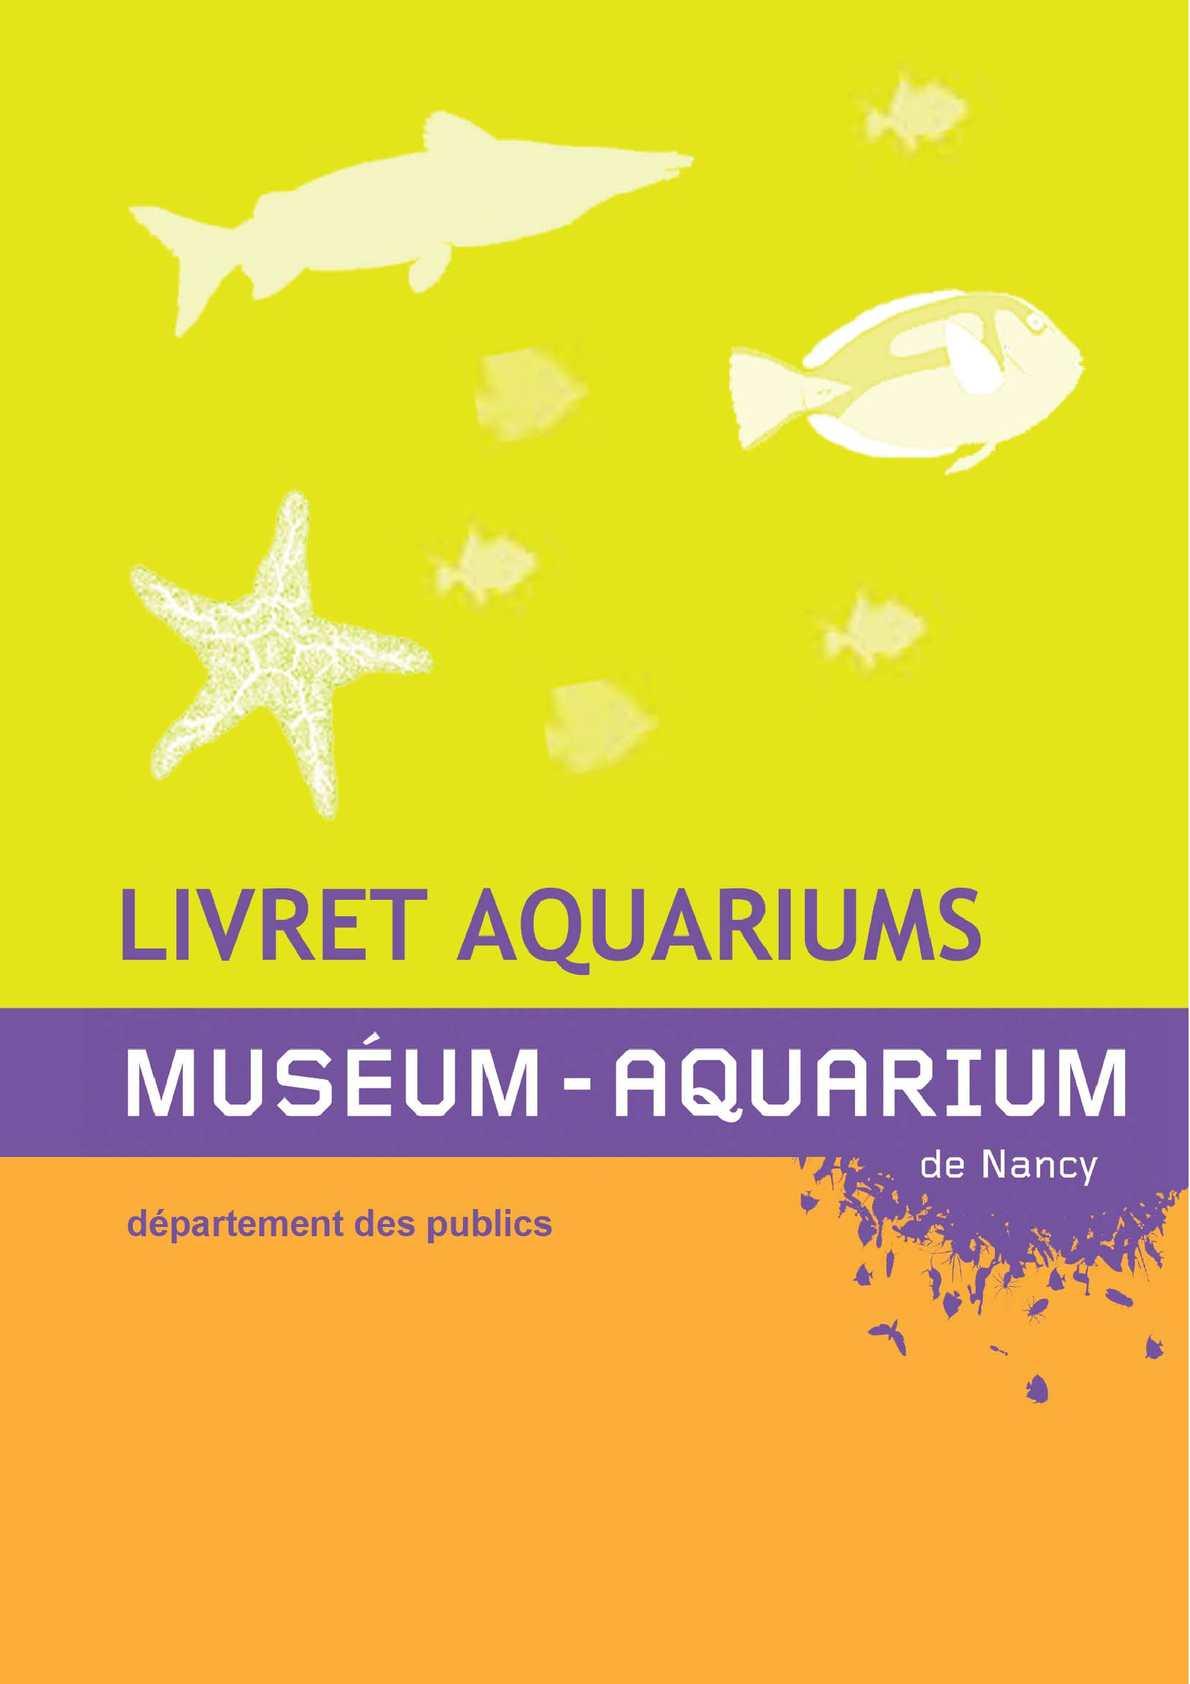 Livret aquariums